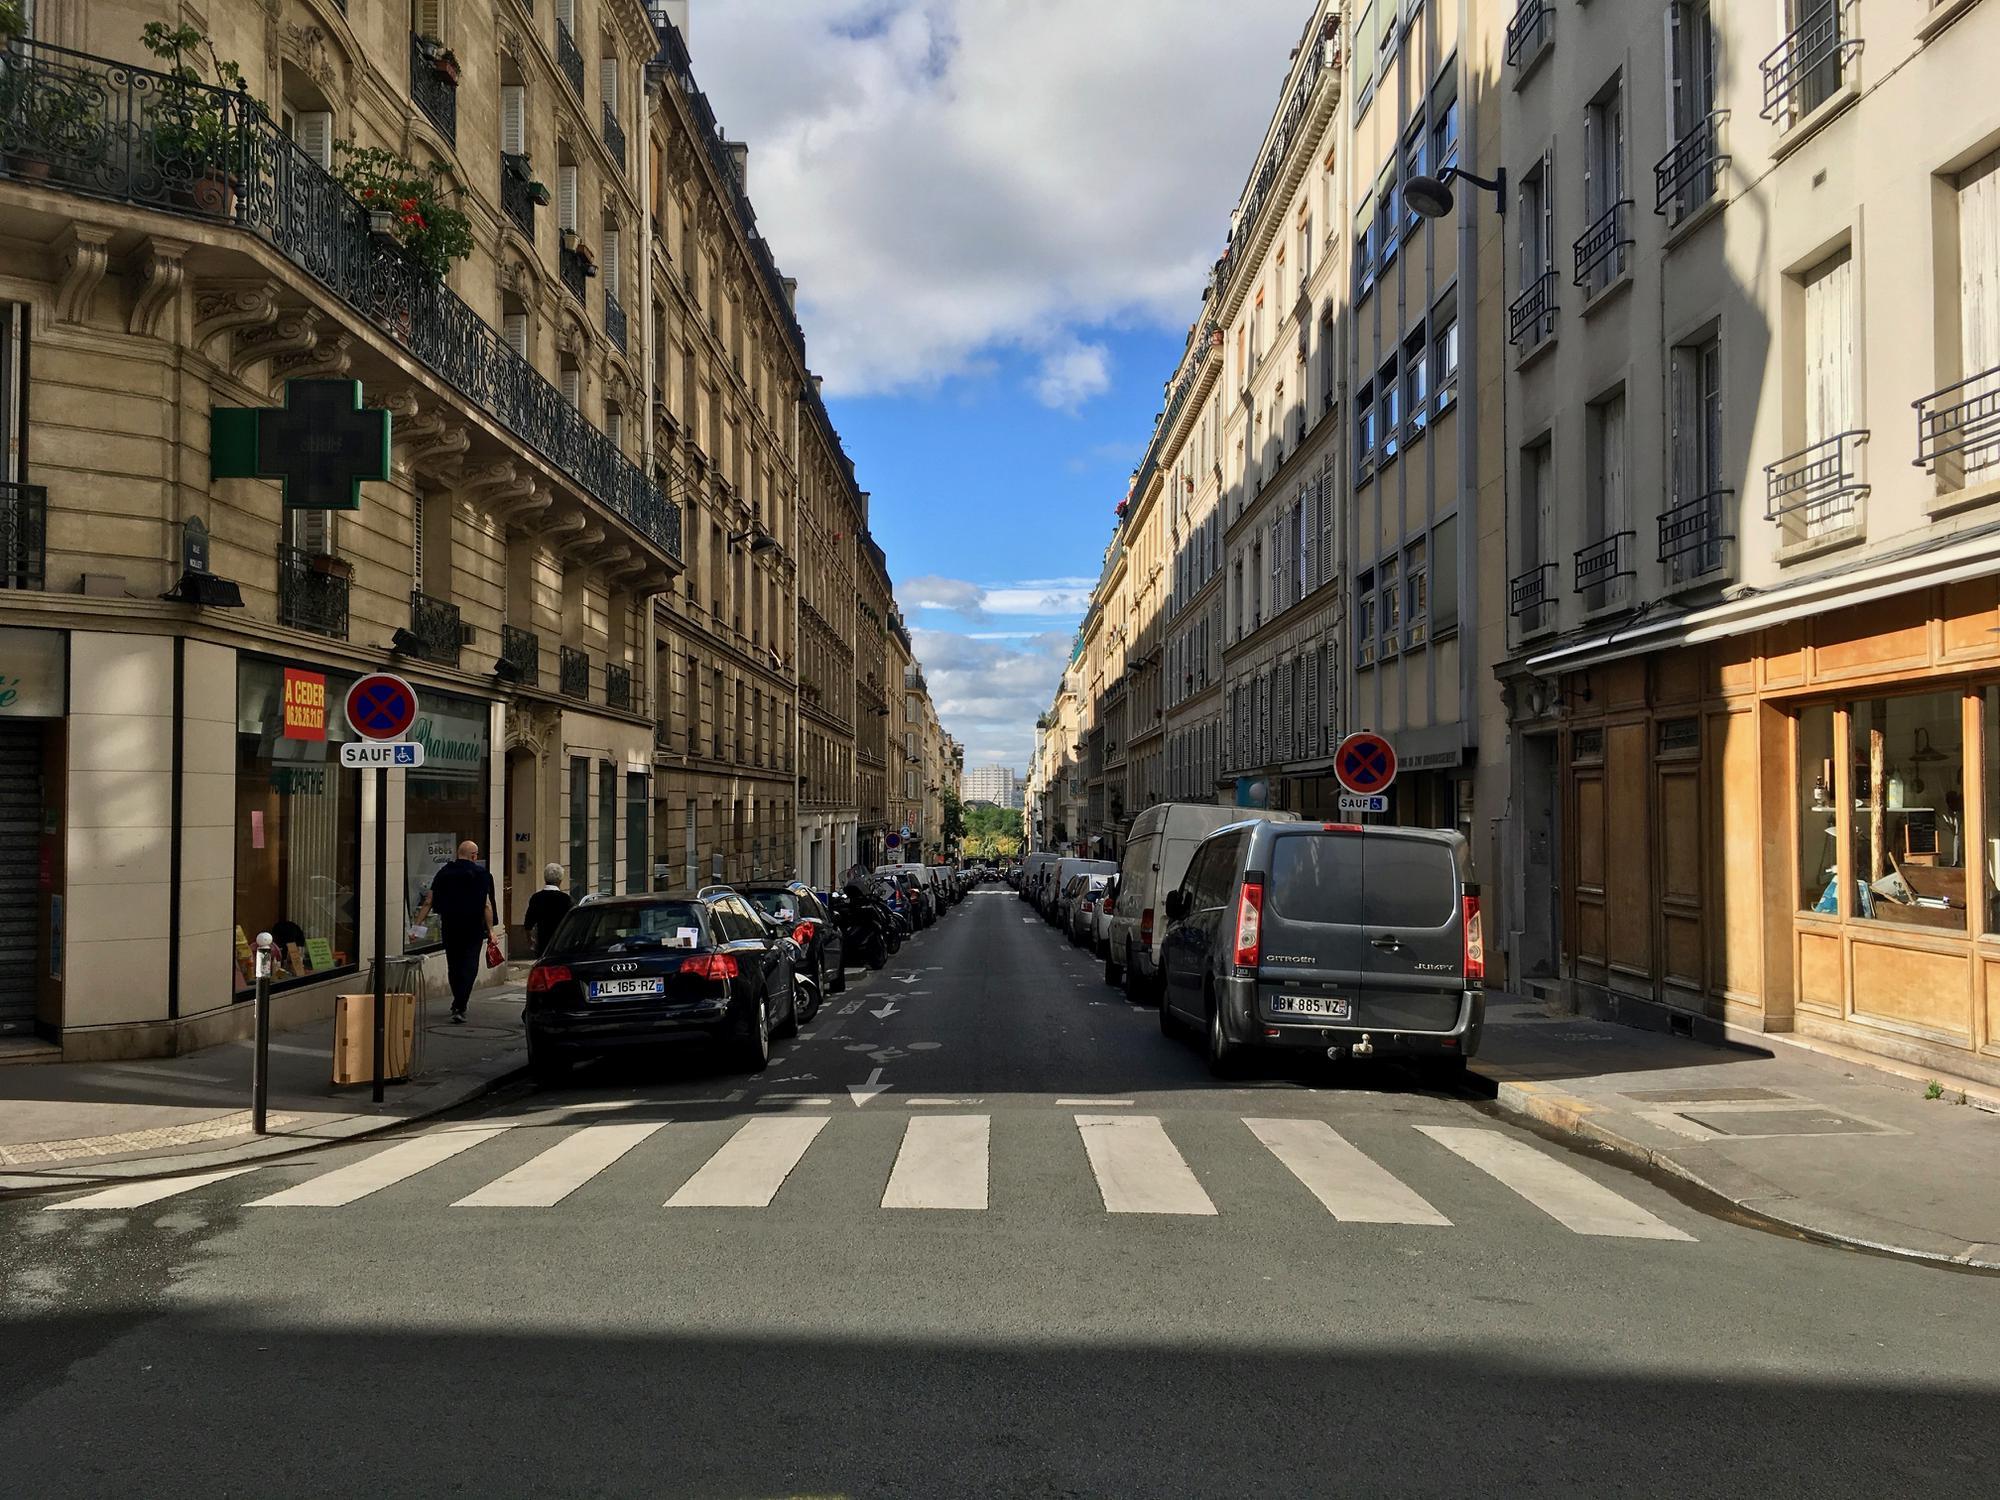 🇫🇷 Париж, Франция, сентябрь 2016.